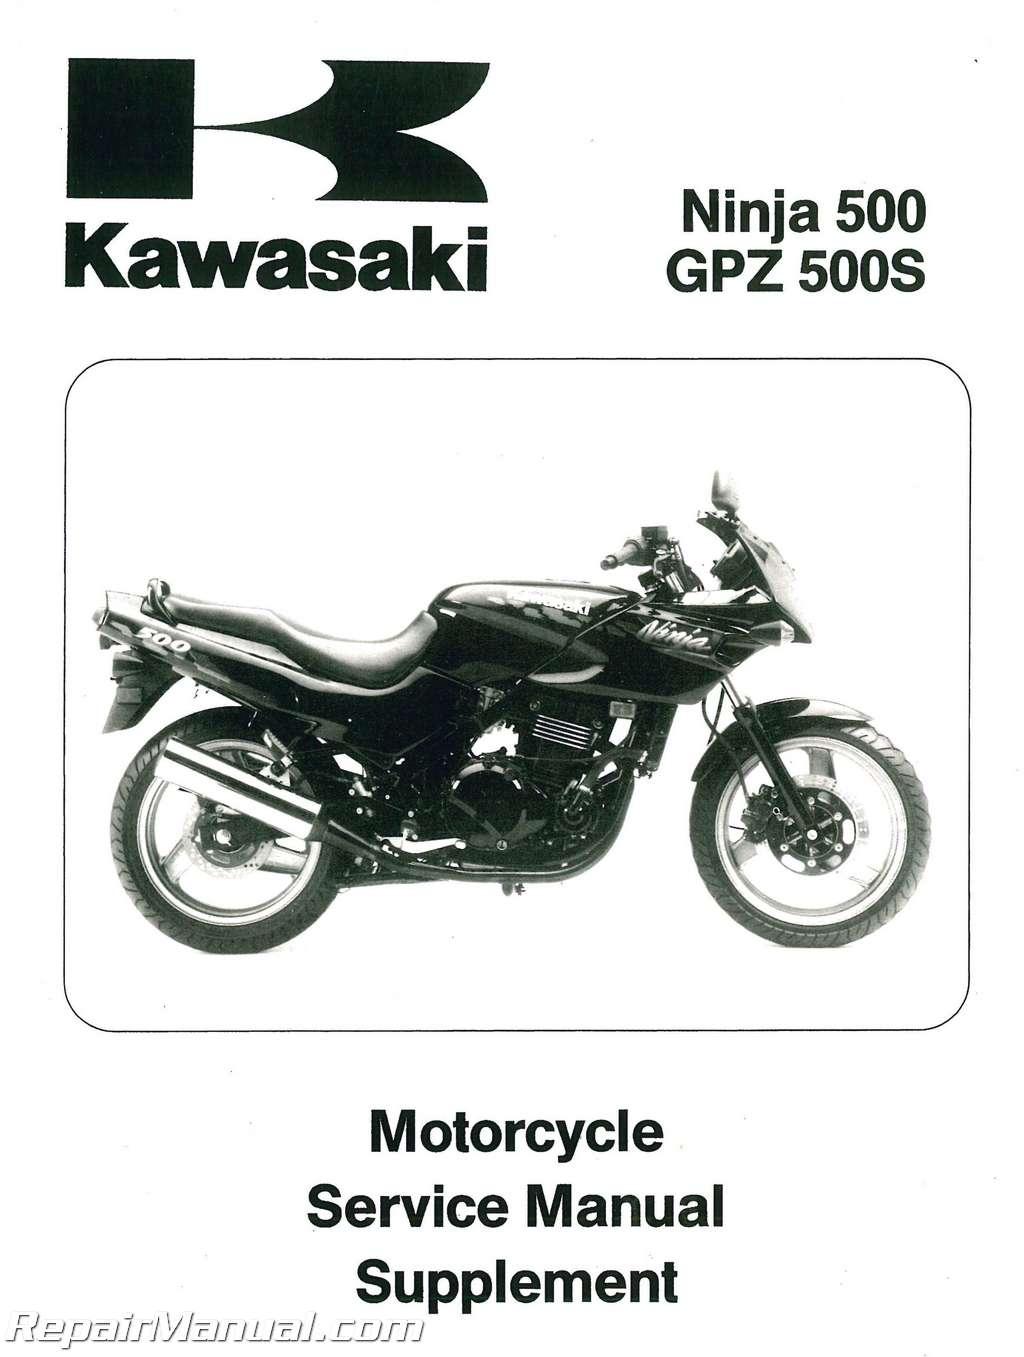 1994-2007-Kawasaki-EX500D-Ninja-Service-Manual-Supplement_001.